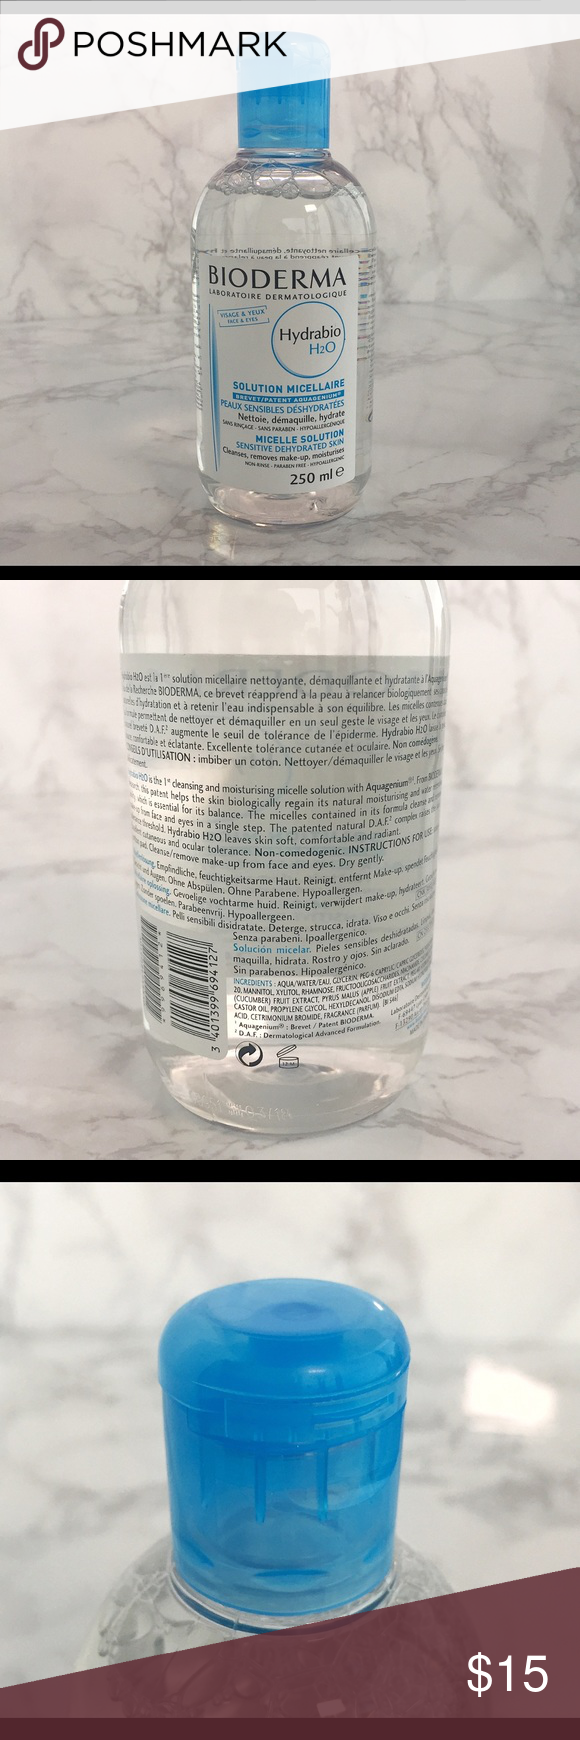 NWT Bioderma Hydrabio H20 Micellar Water 250ml Bioderma